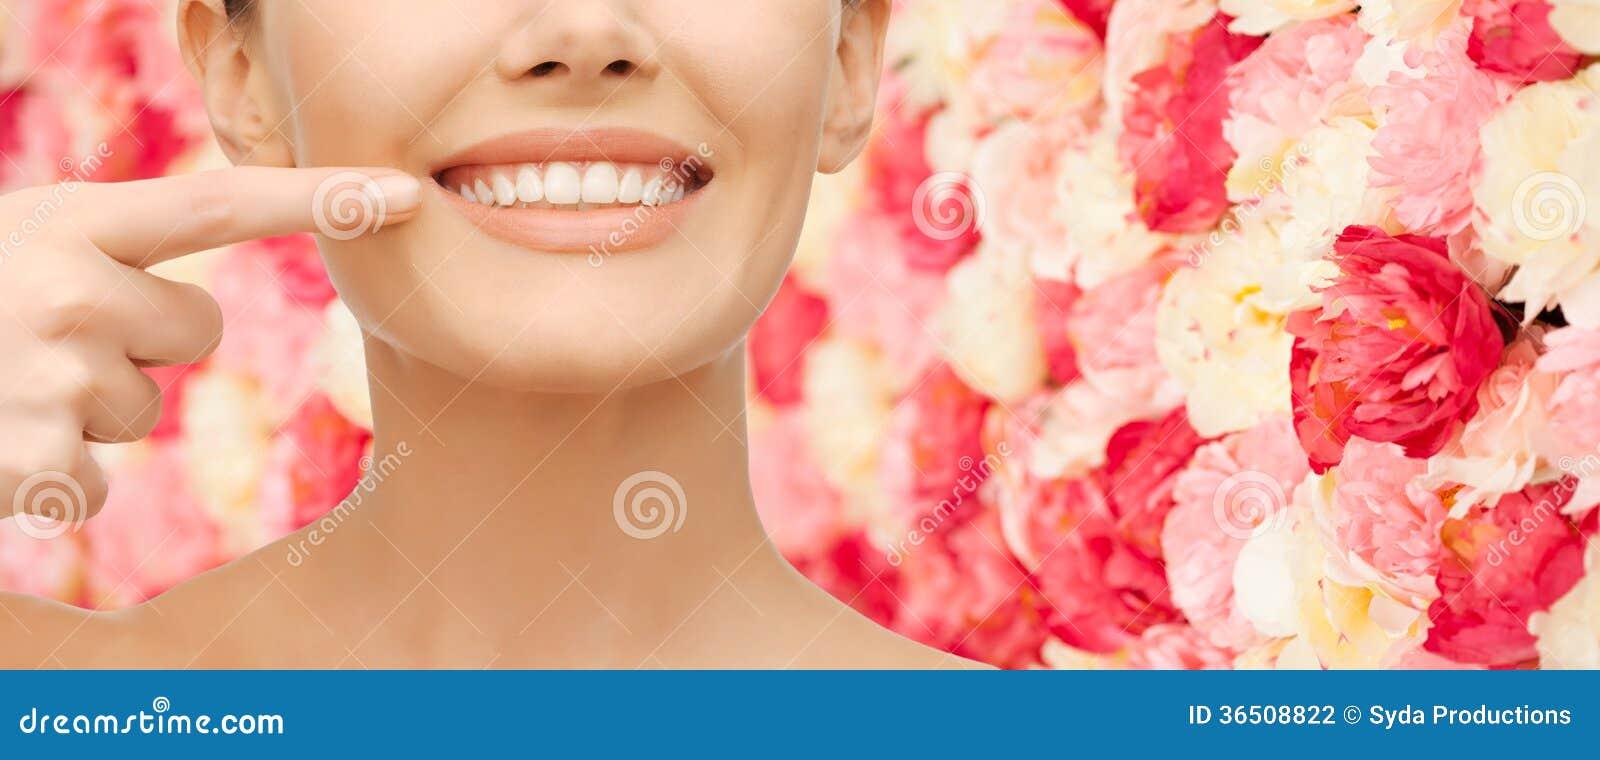 Belle femme indiquant des dents